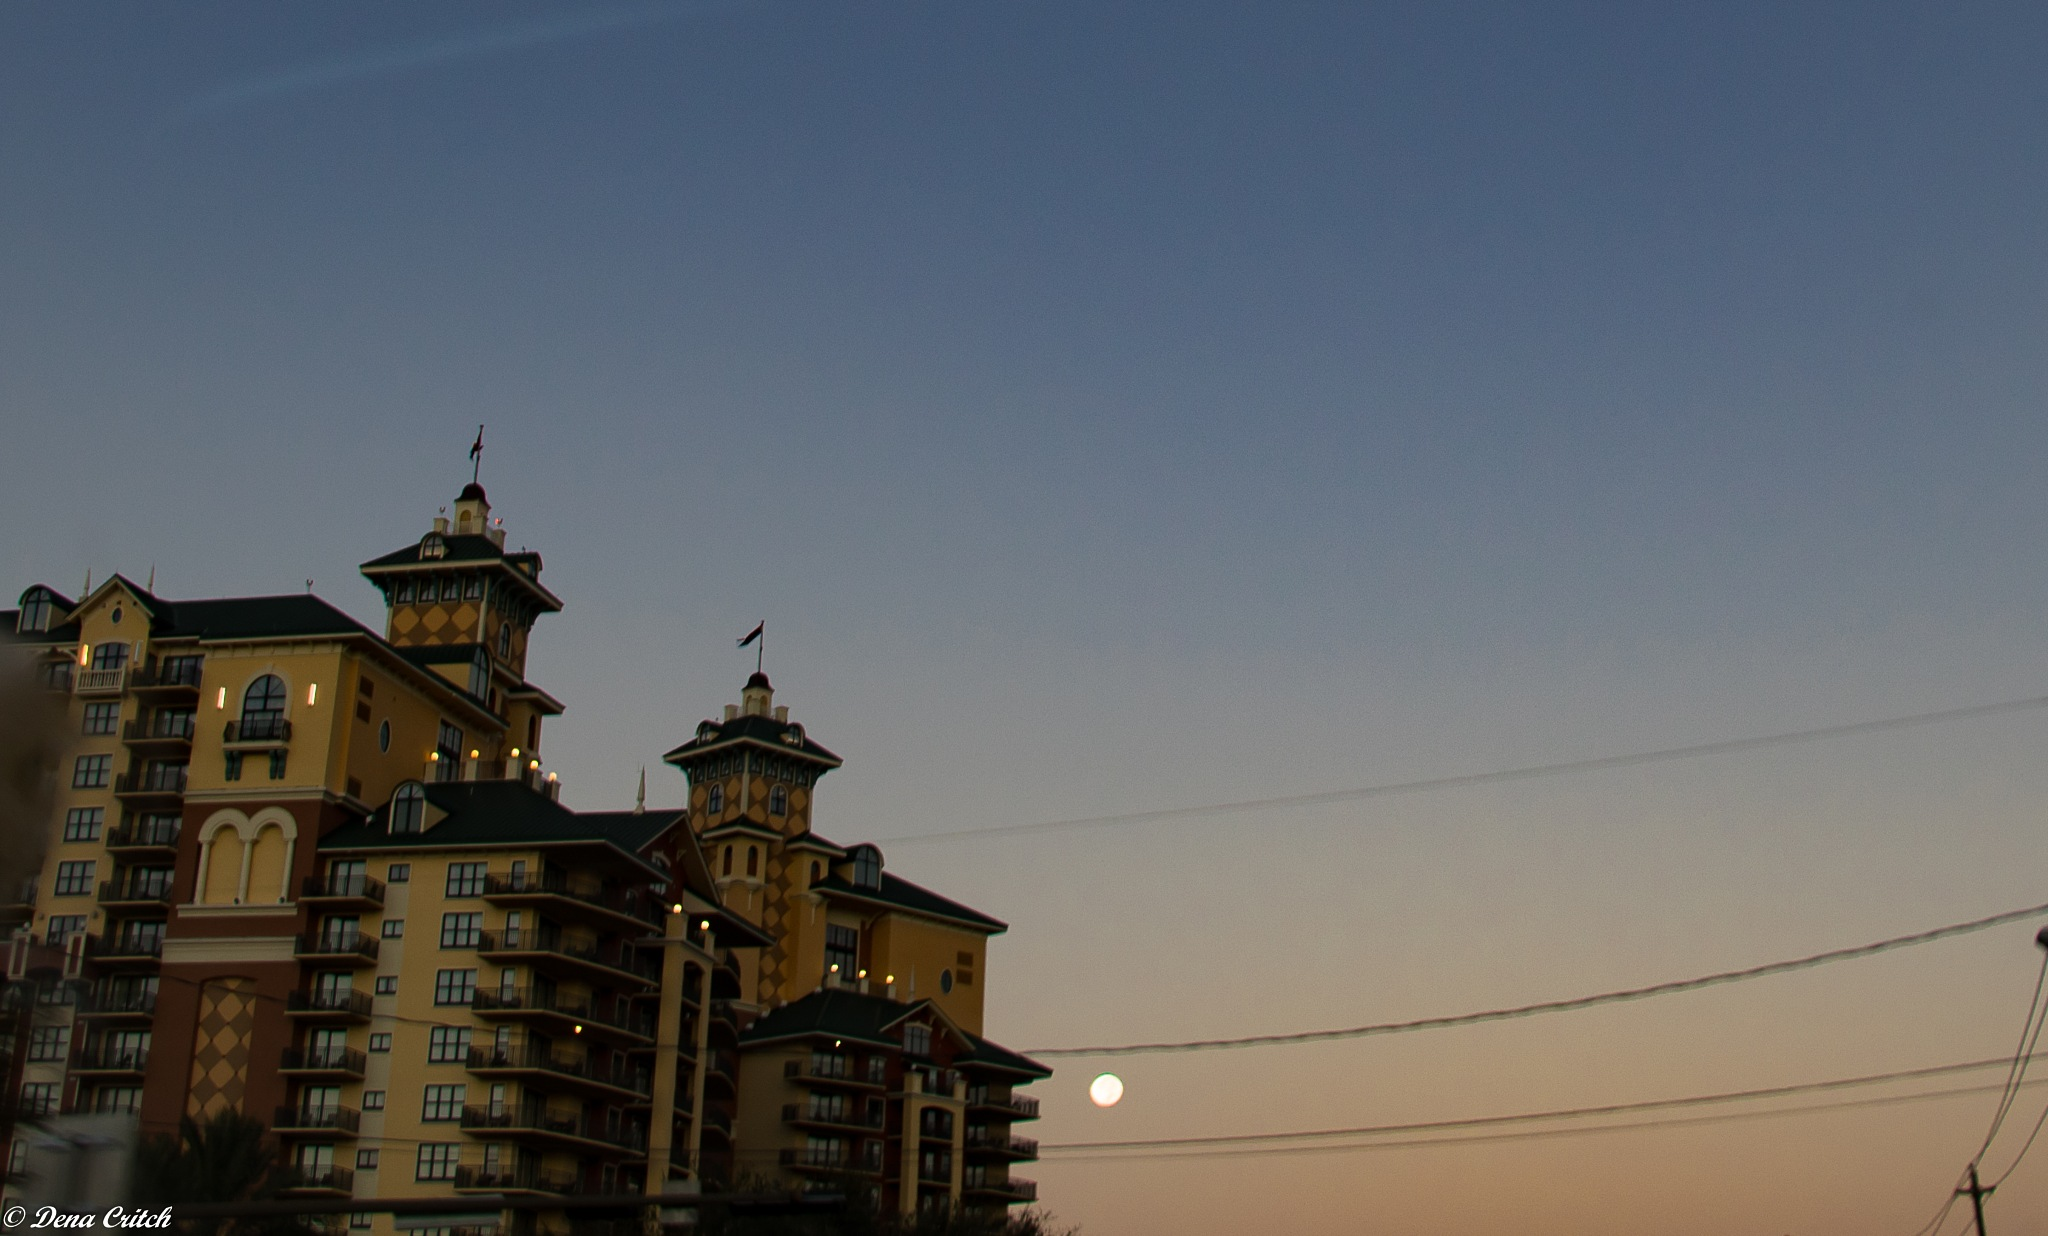 Full Moon at Dawn by dena.critch